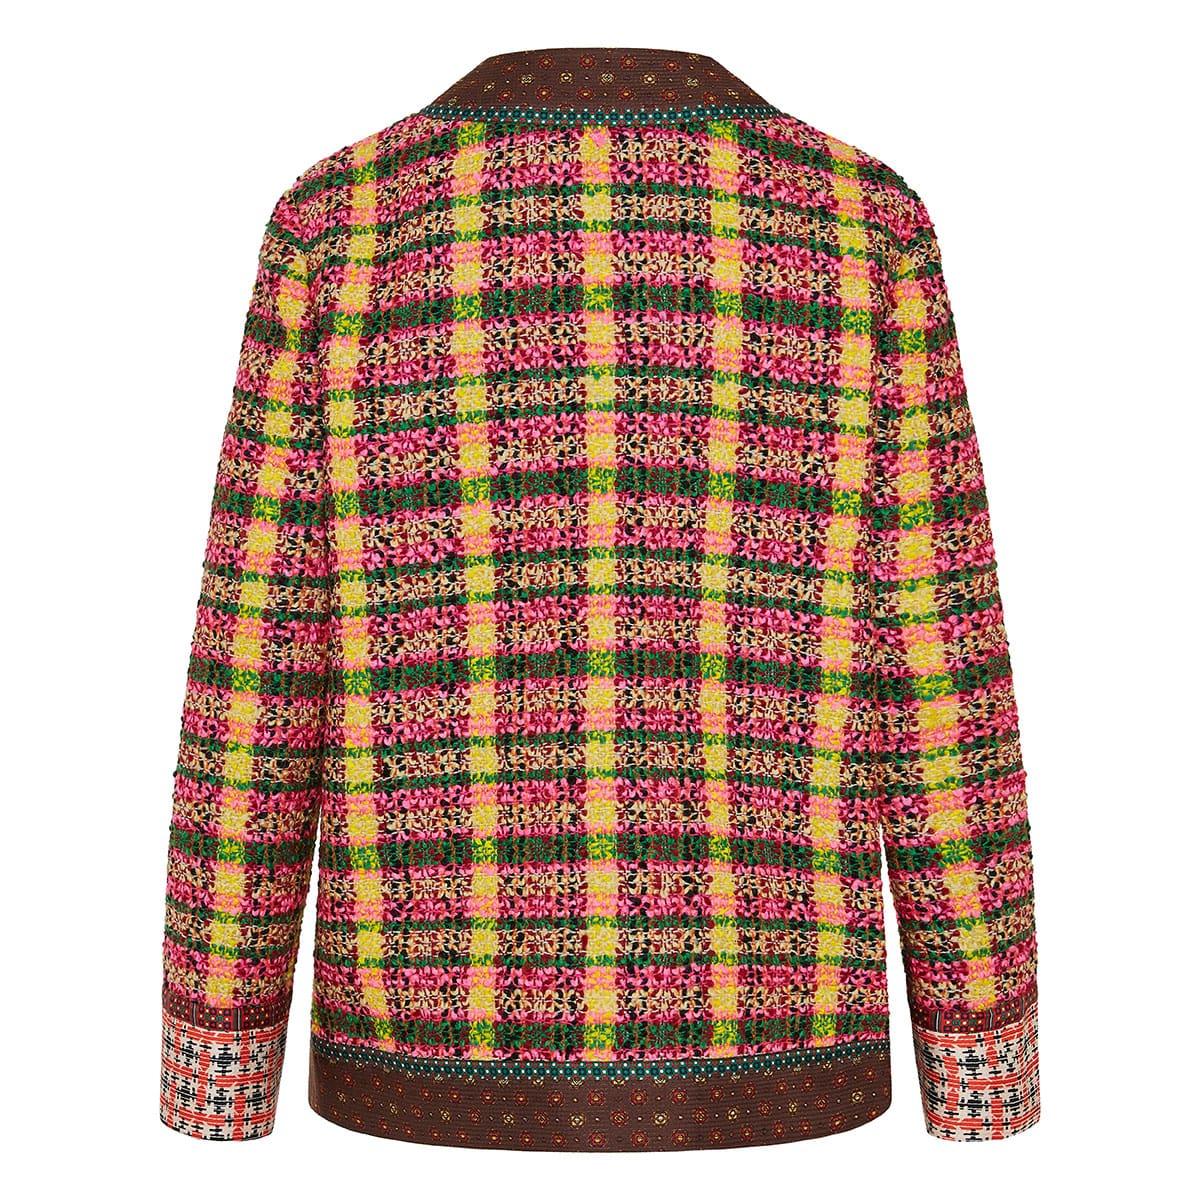 Oversized tweed checked cardigan